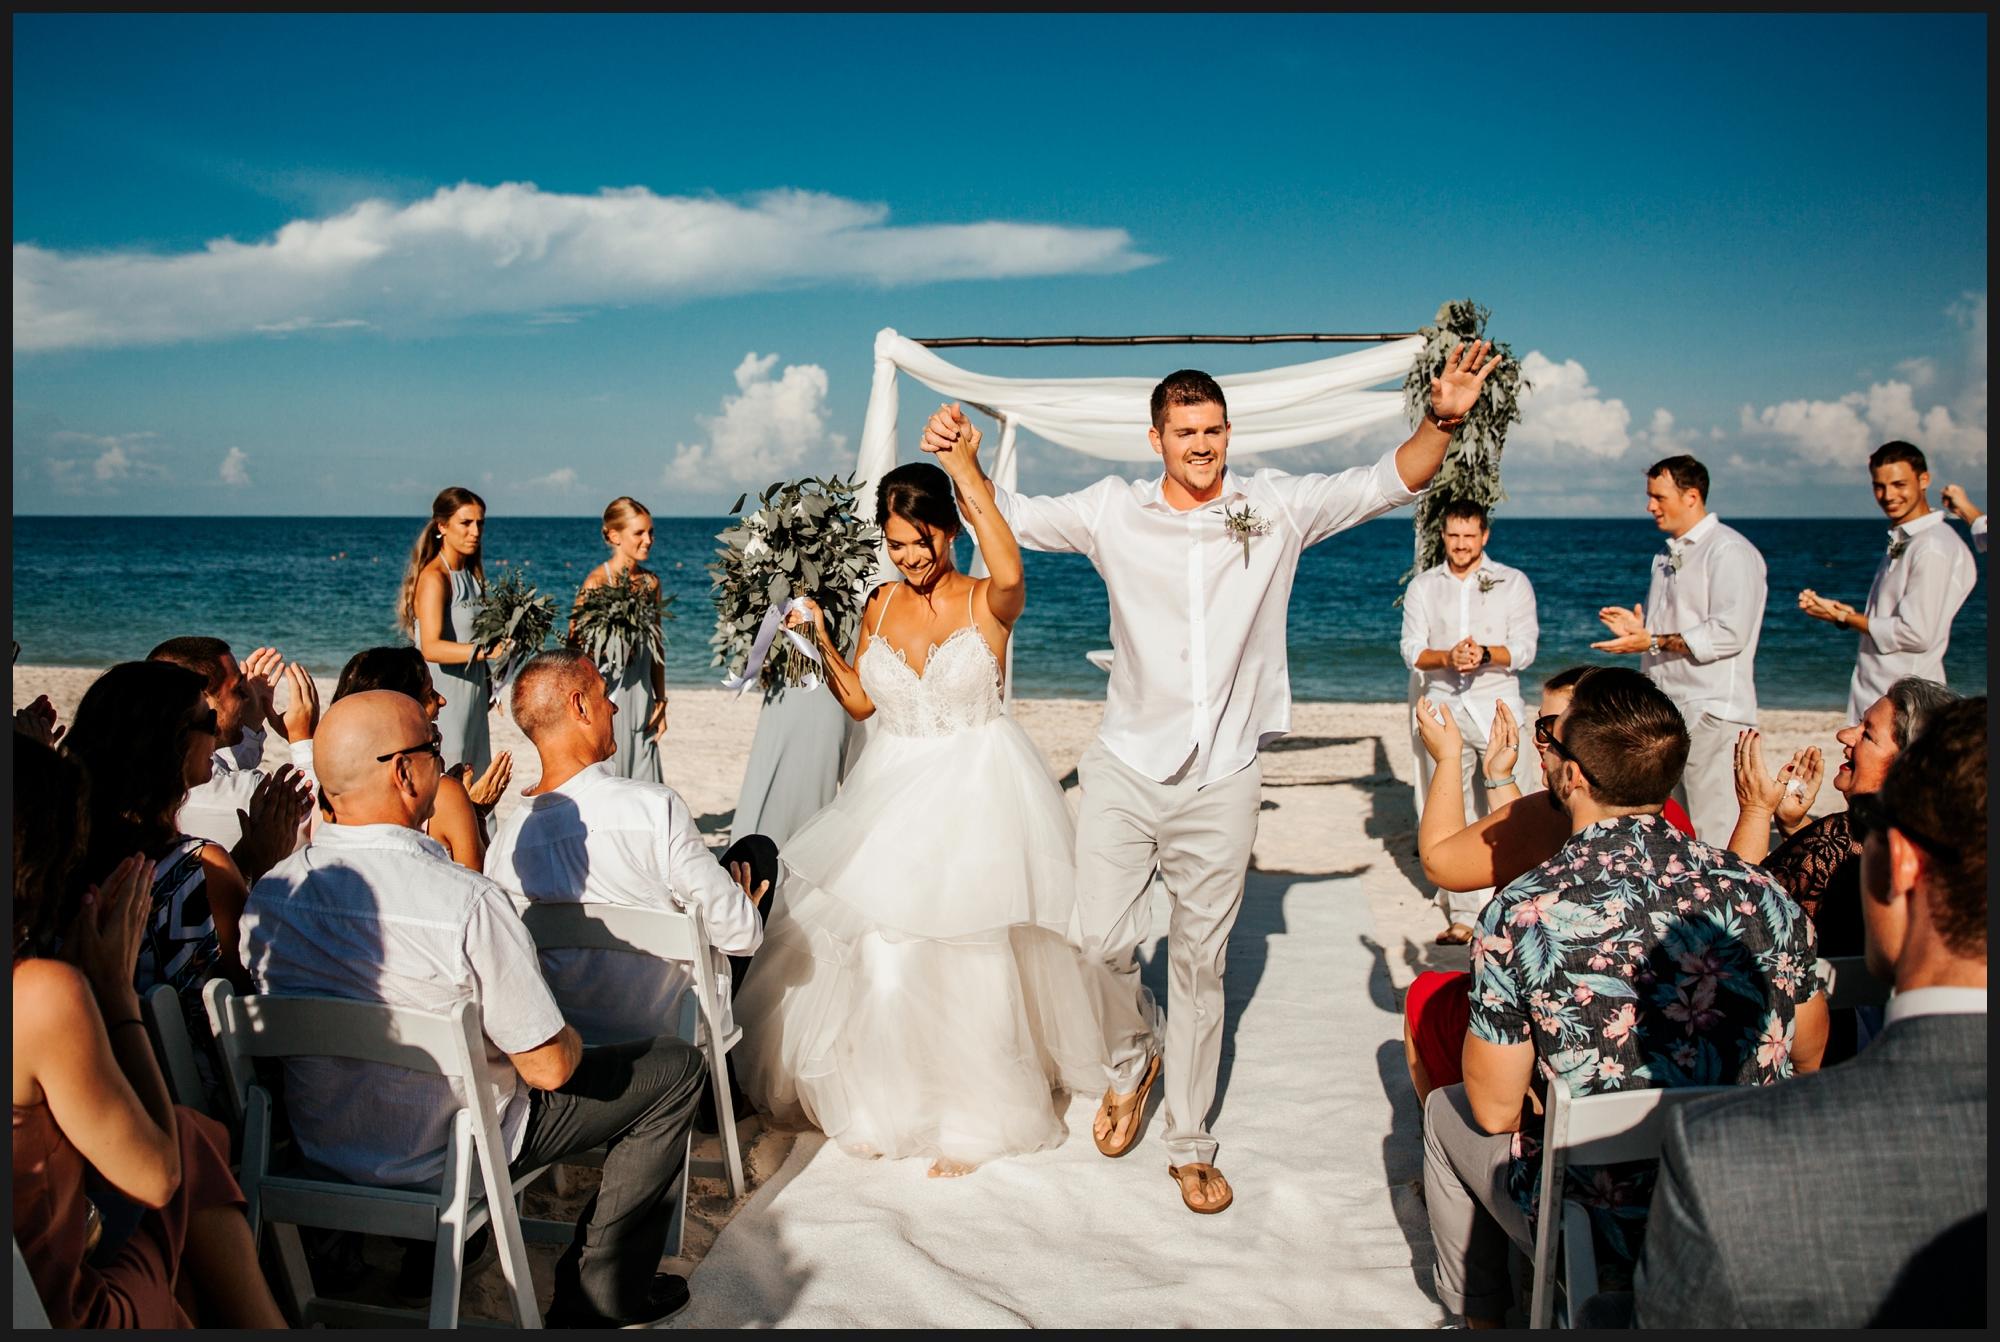 Orlando-Wedding-Photographer-destination-wedding-photographer-florida-wedding-photographer-bohemian-wedding-photographer_0506.jpg